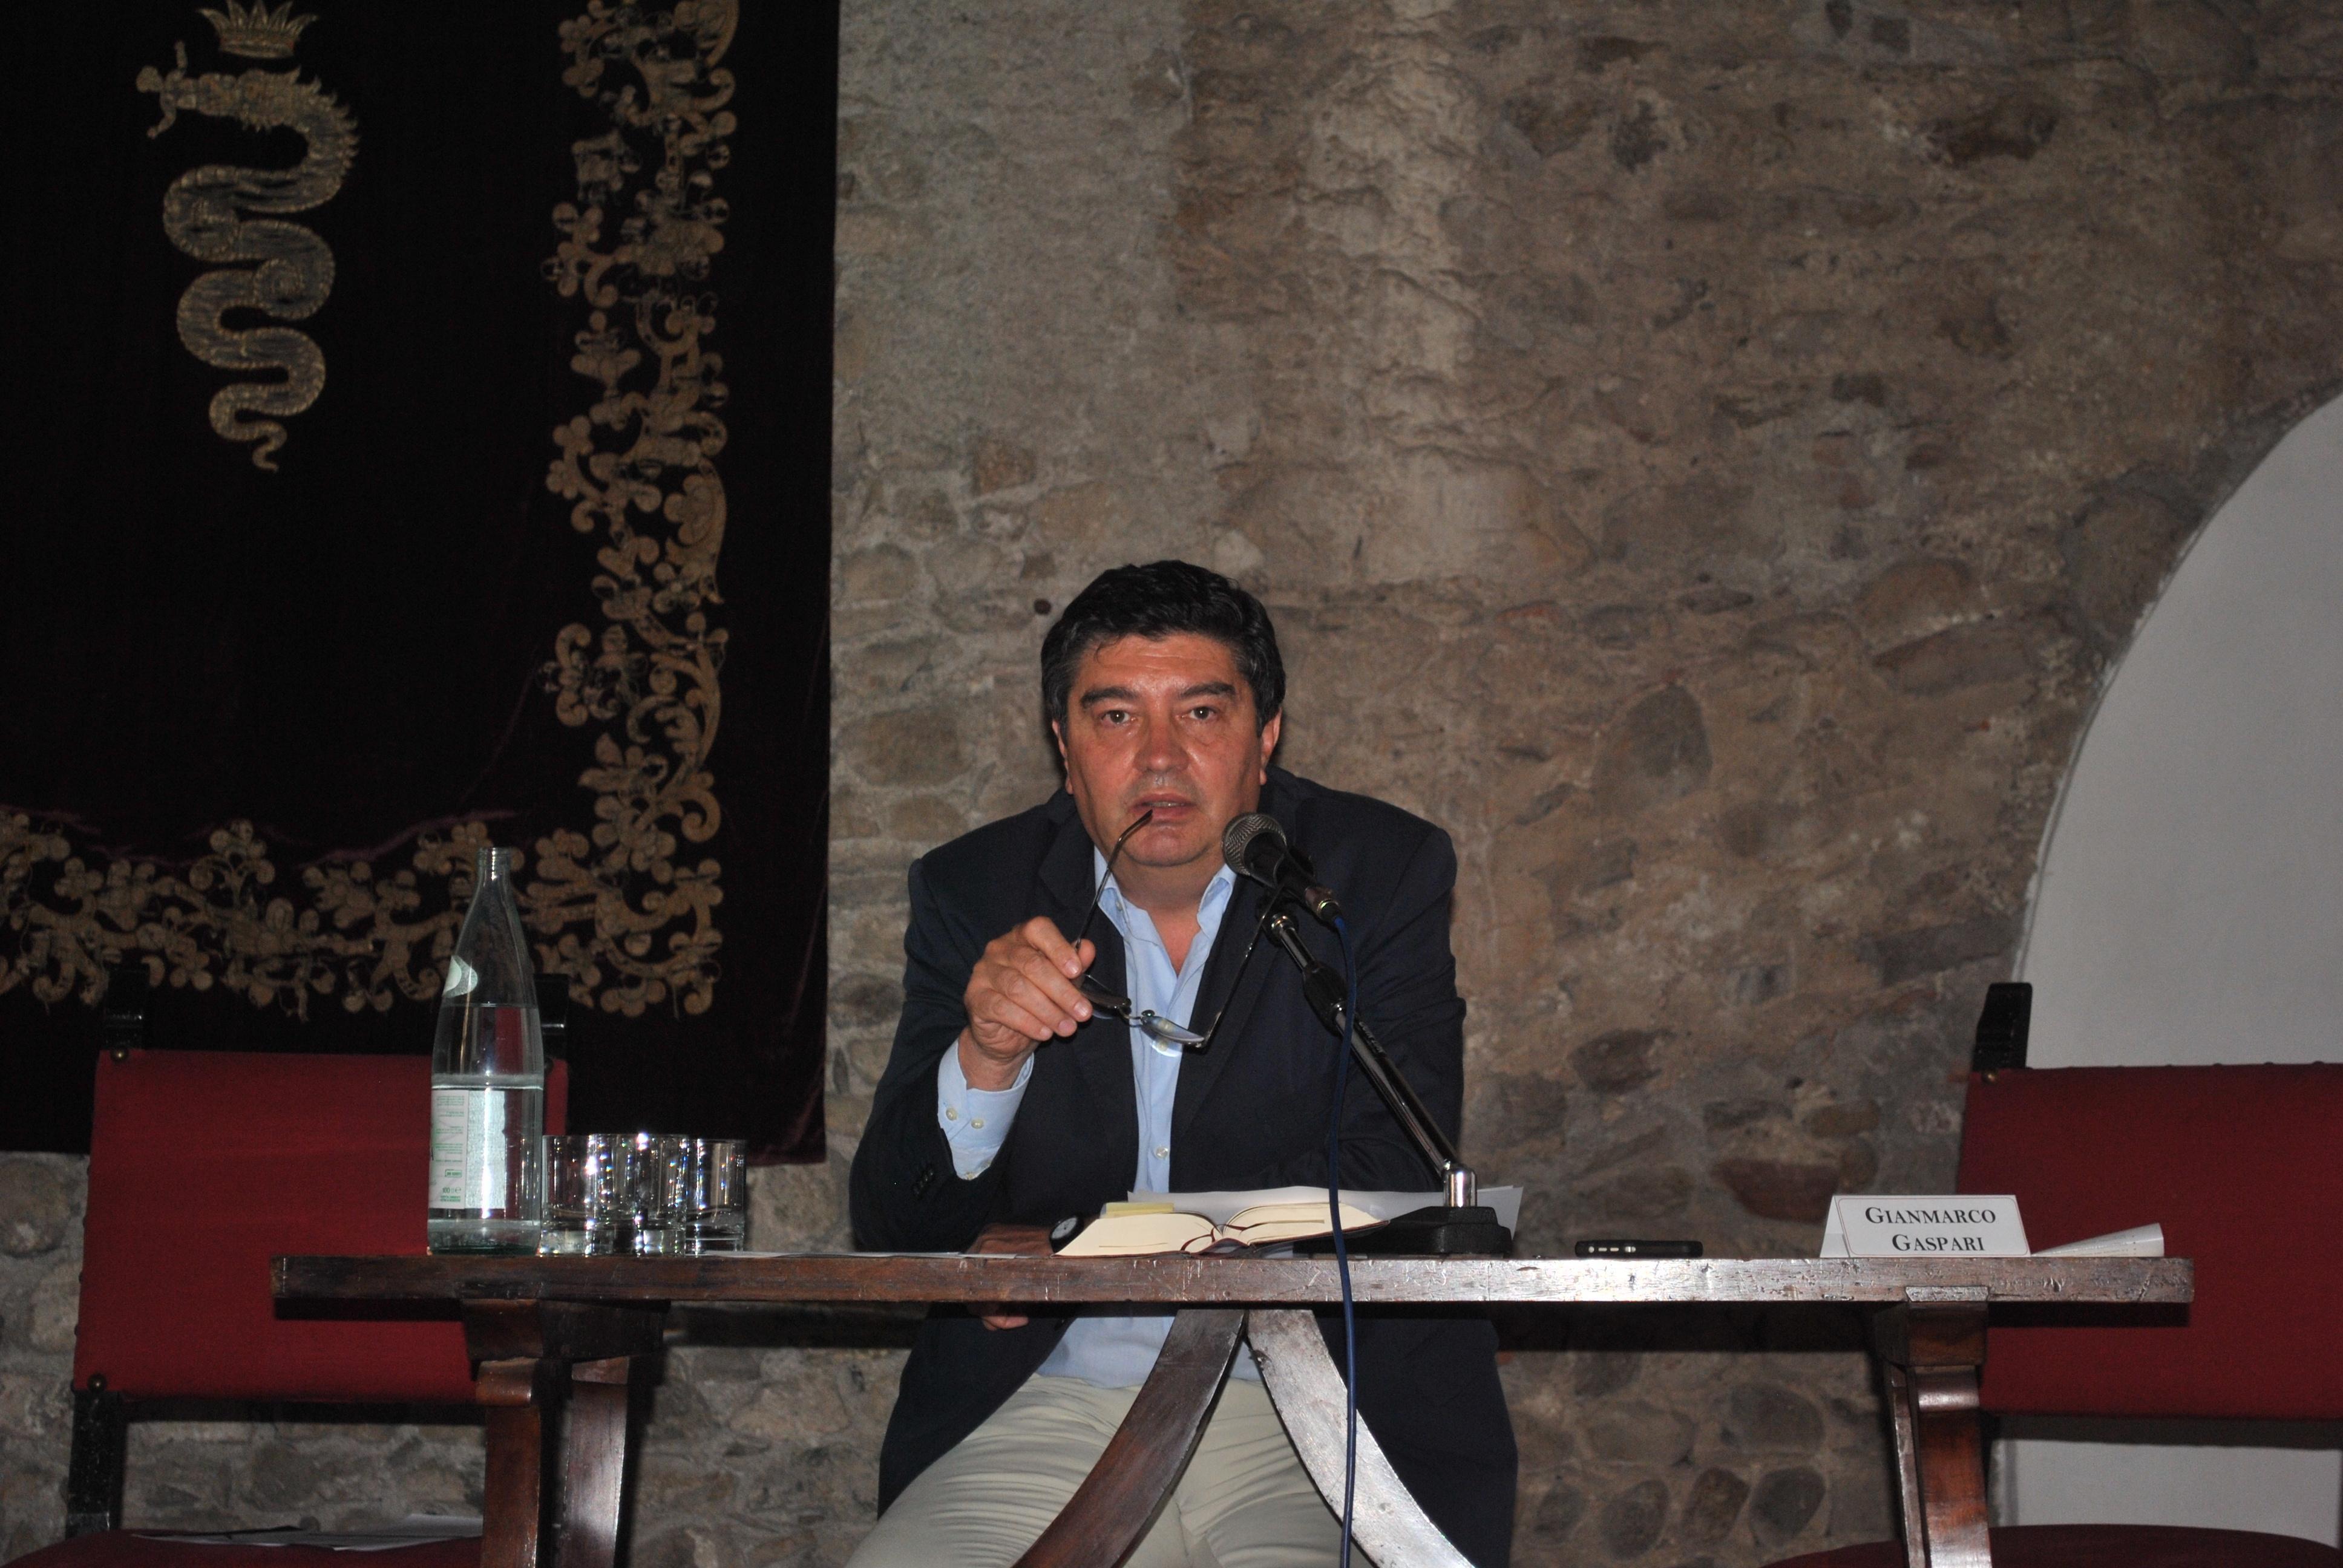 <p>Gianmarco Gaspari</p>